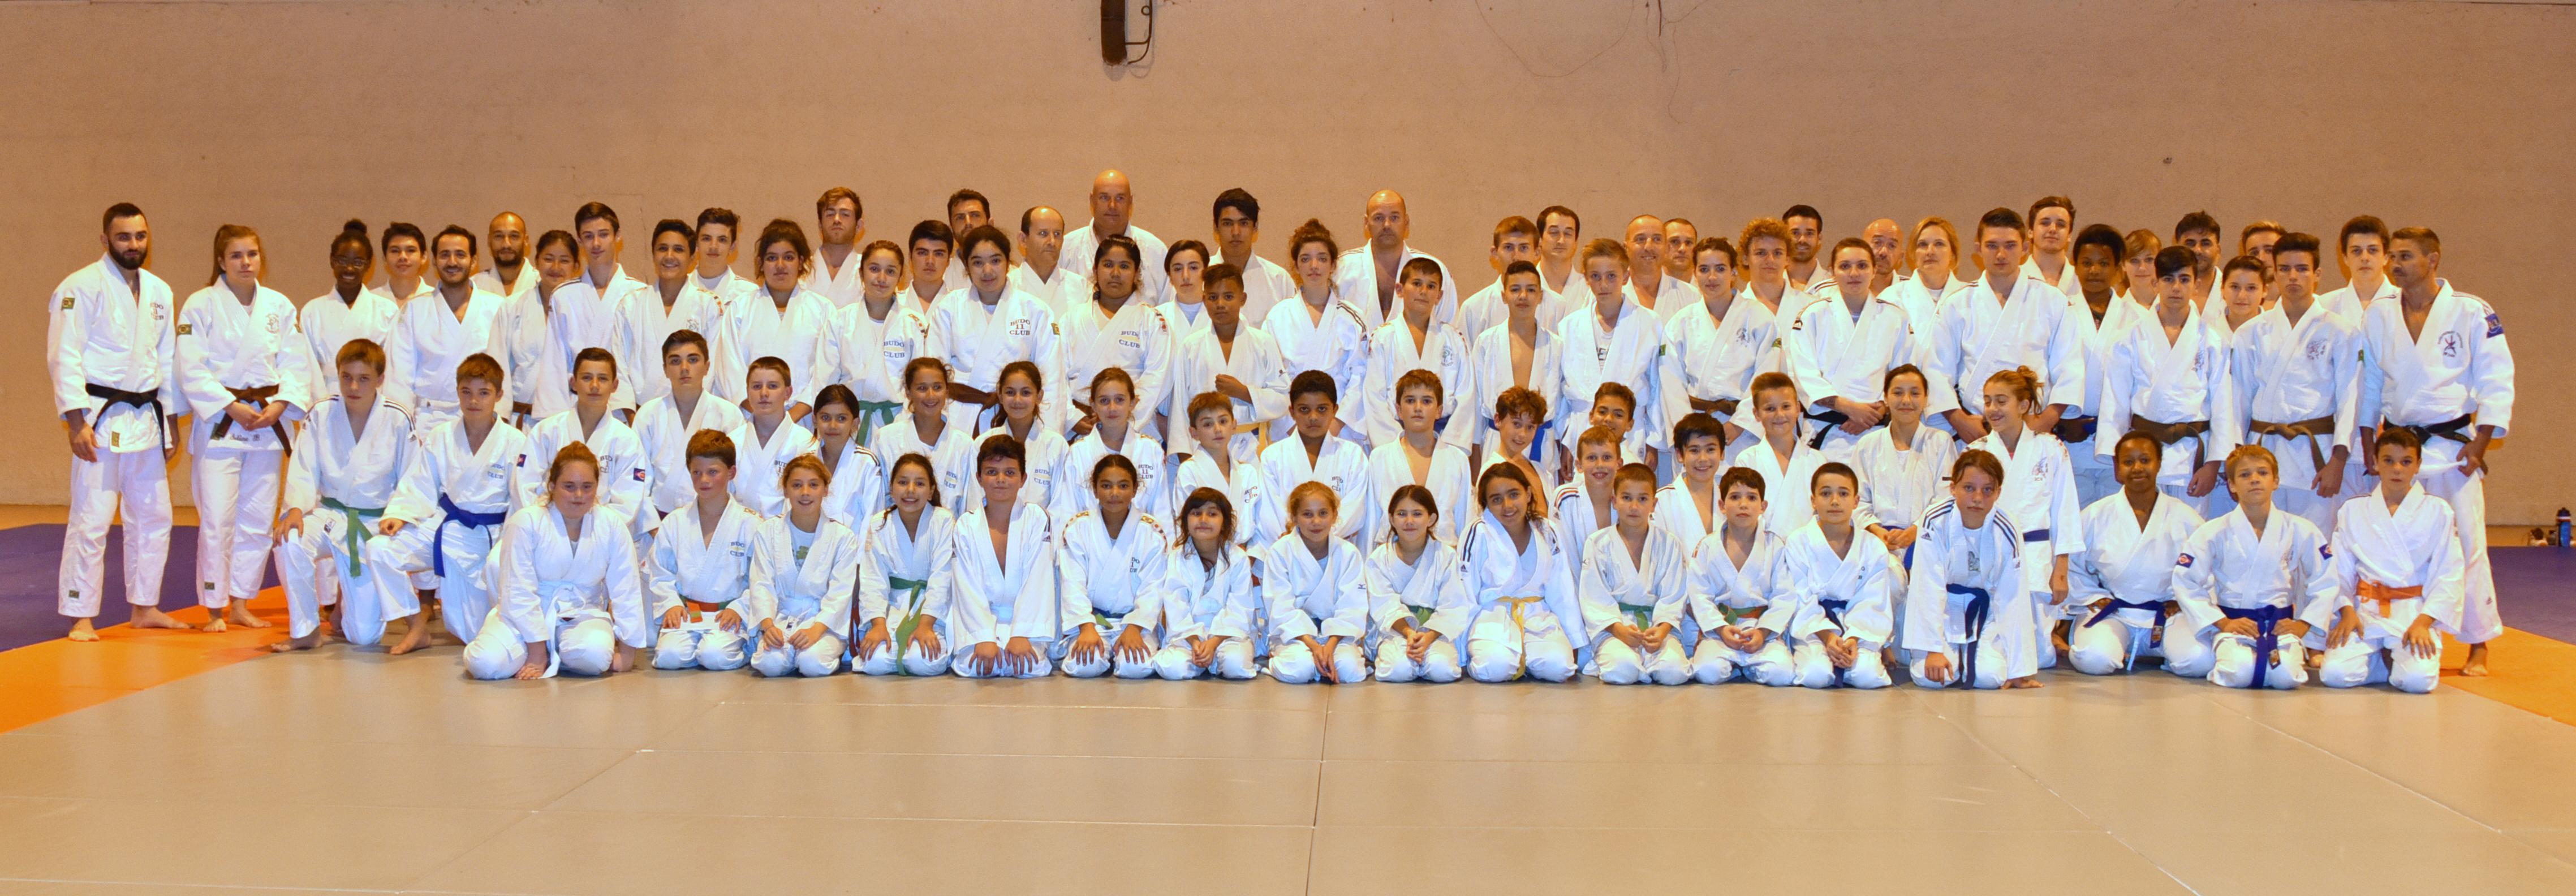 judo rassemblement de masse2